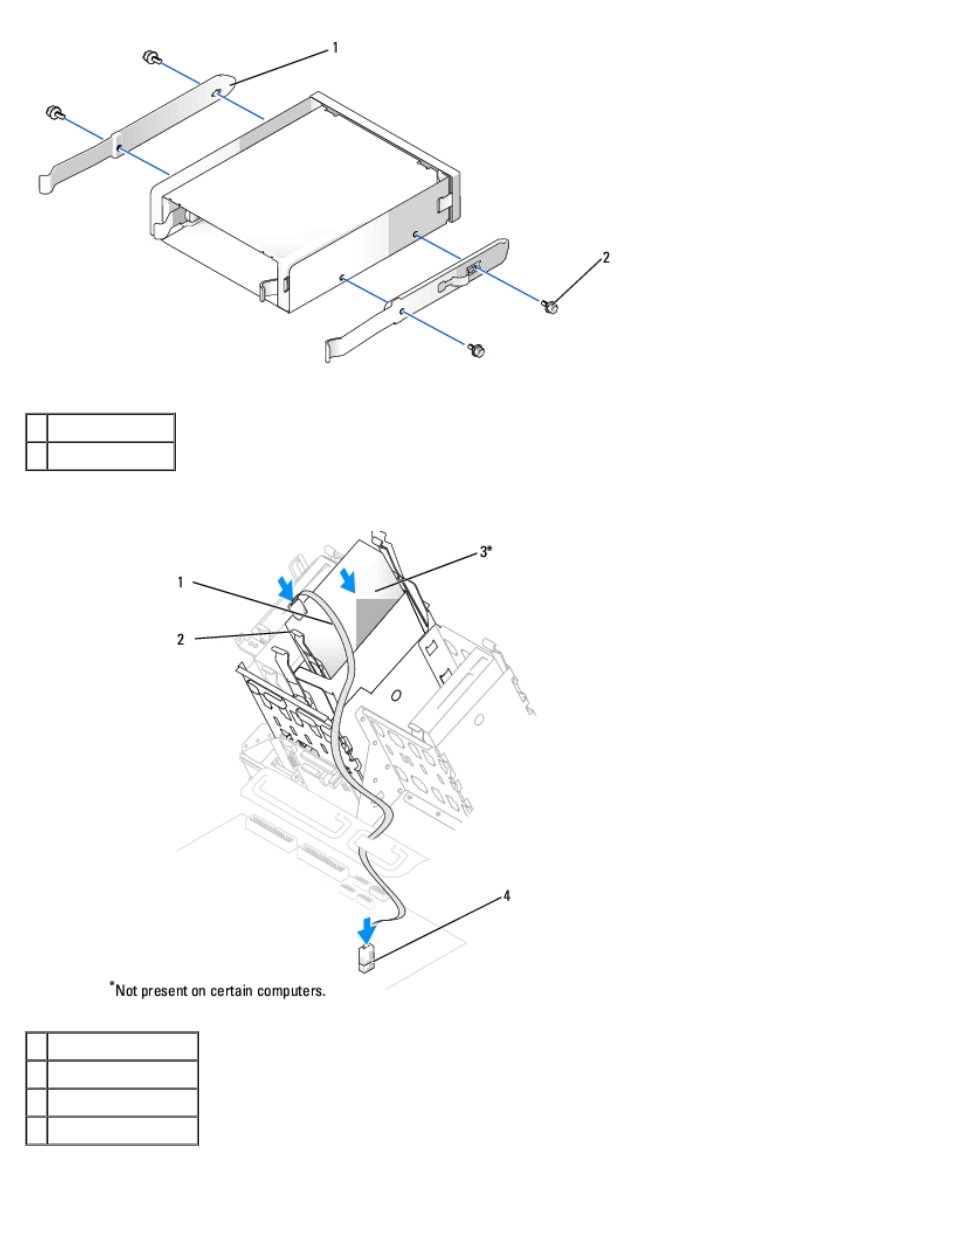 dell xps 600 user manual page 52 79 rh manualsdir com Dell Dimension XPS WHL Dell Dimension XPS WHL